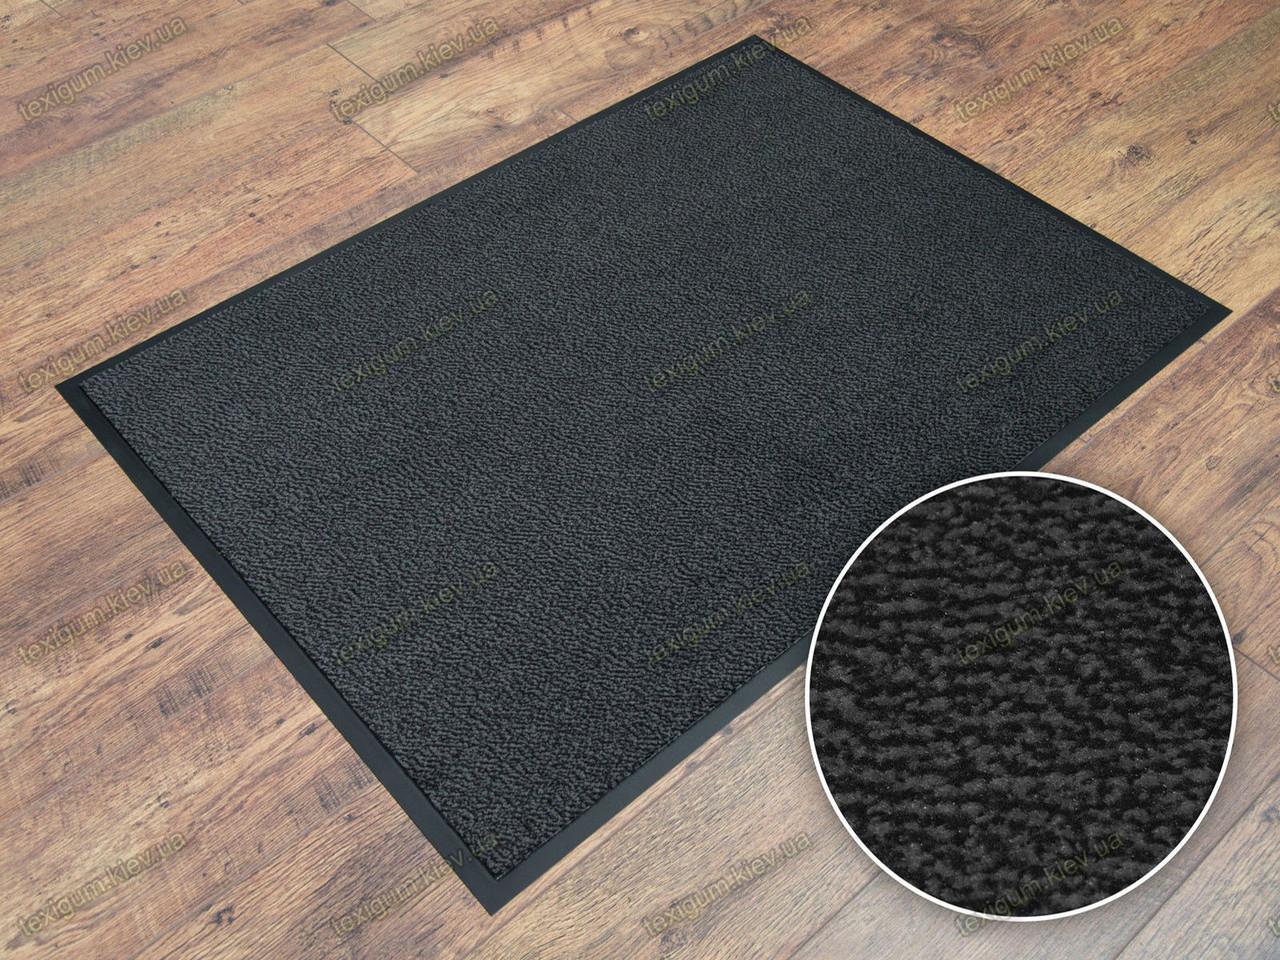 Грязезащитный ковер Париж темно-серый 90х150см